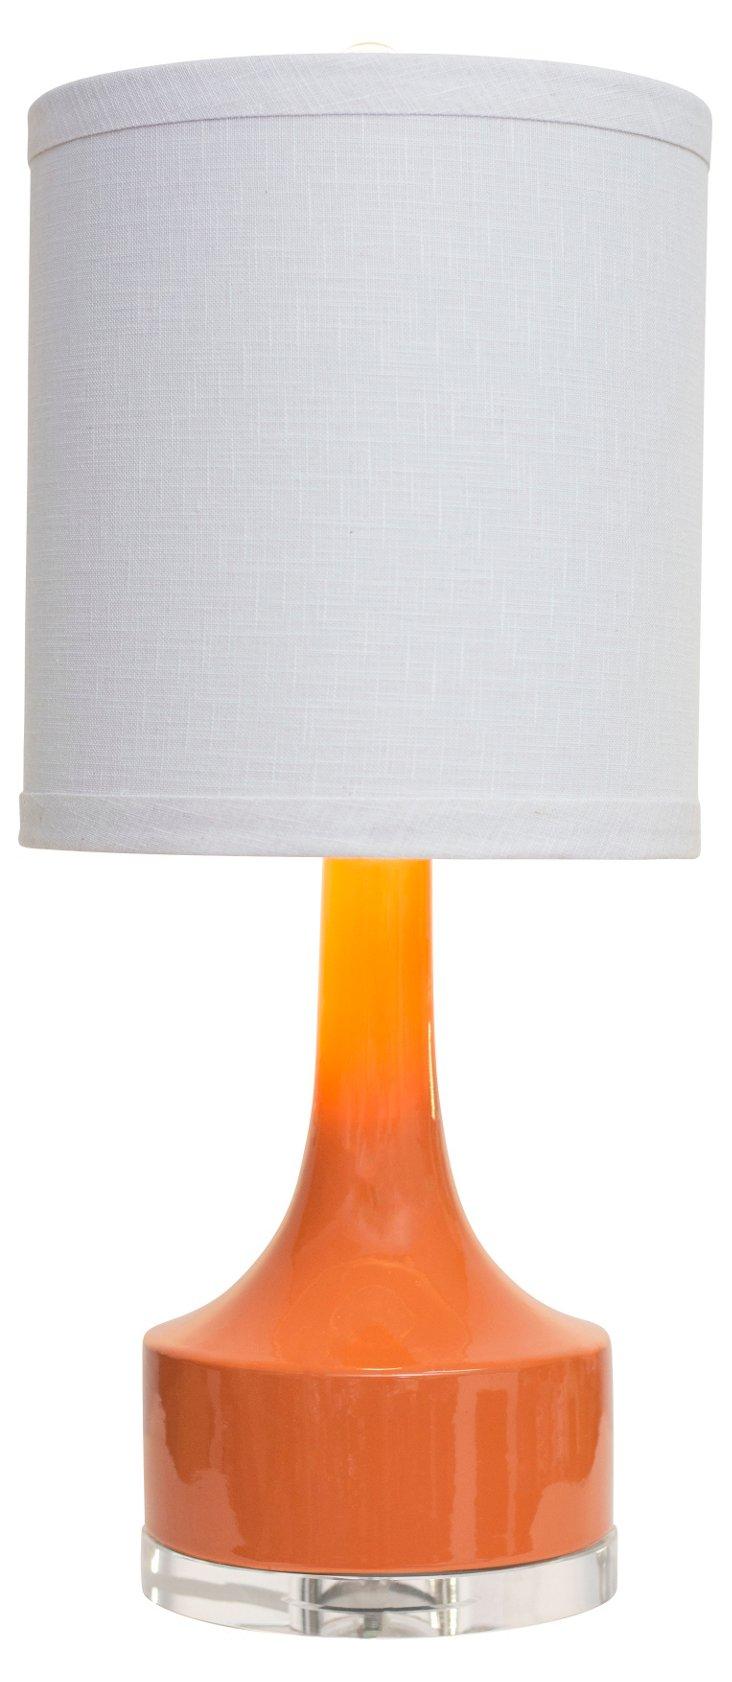 Holmby Table Lamp, Orange Gloss